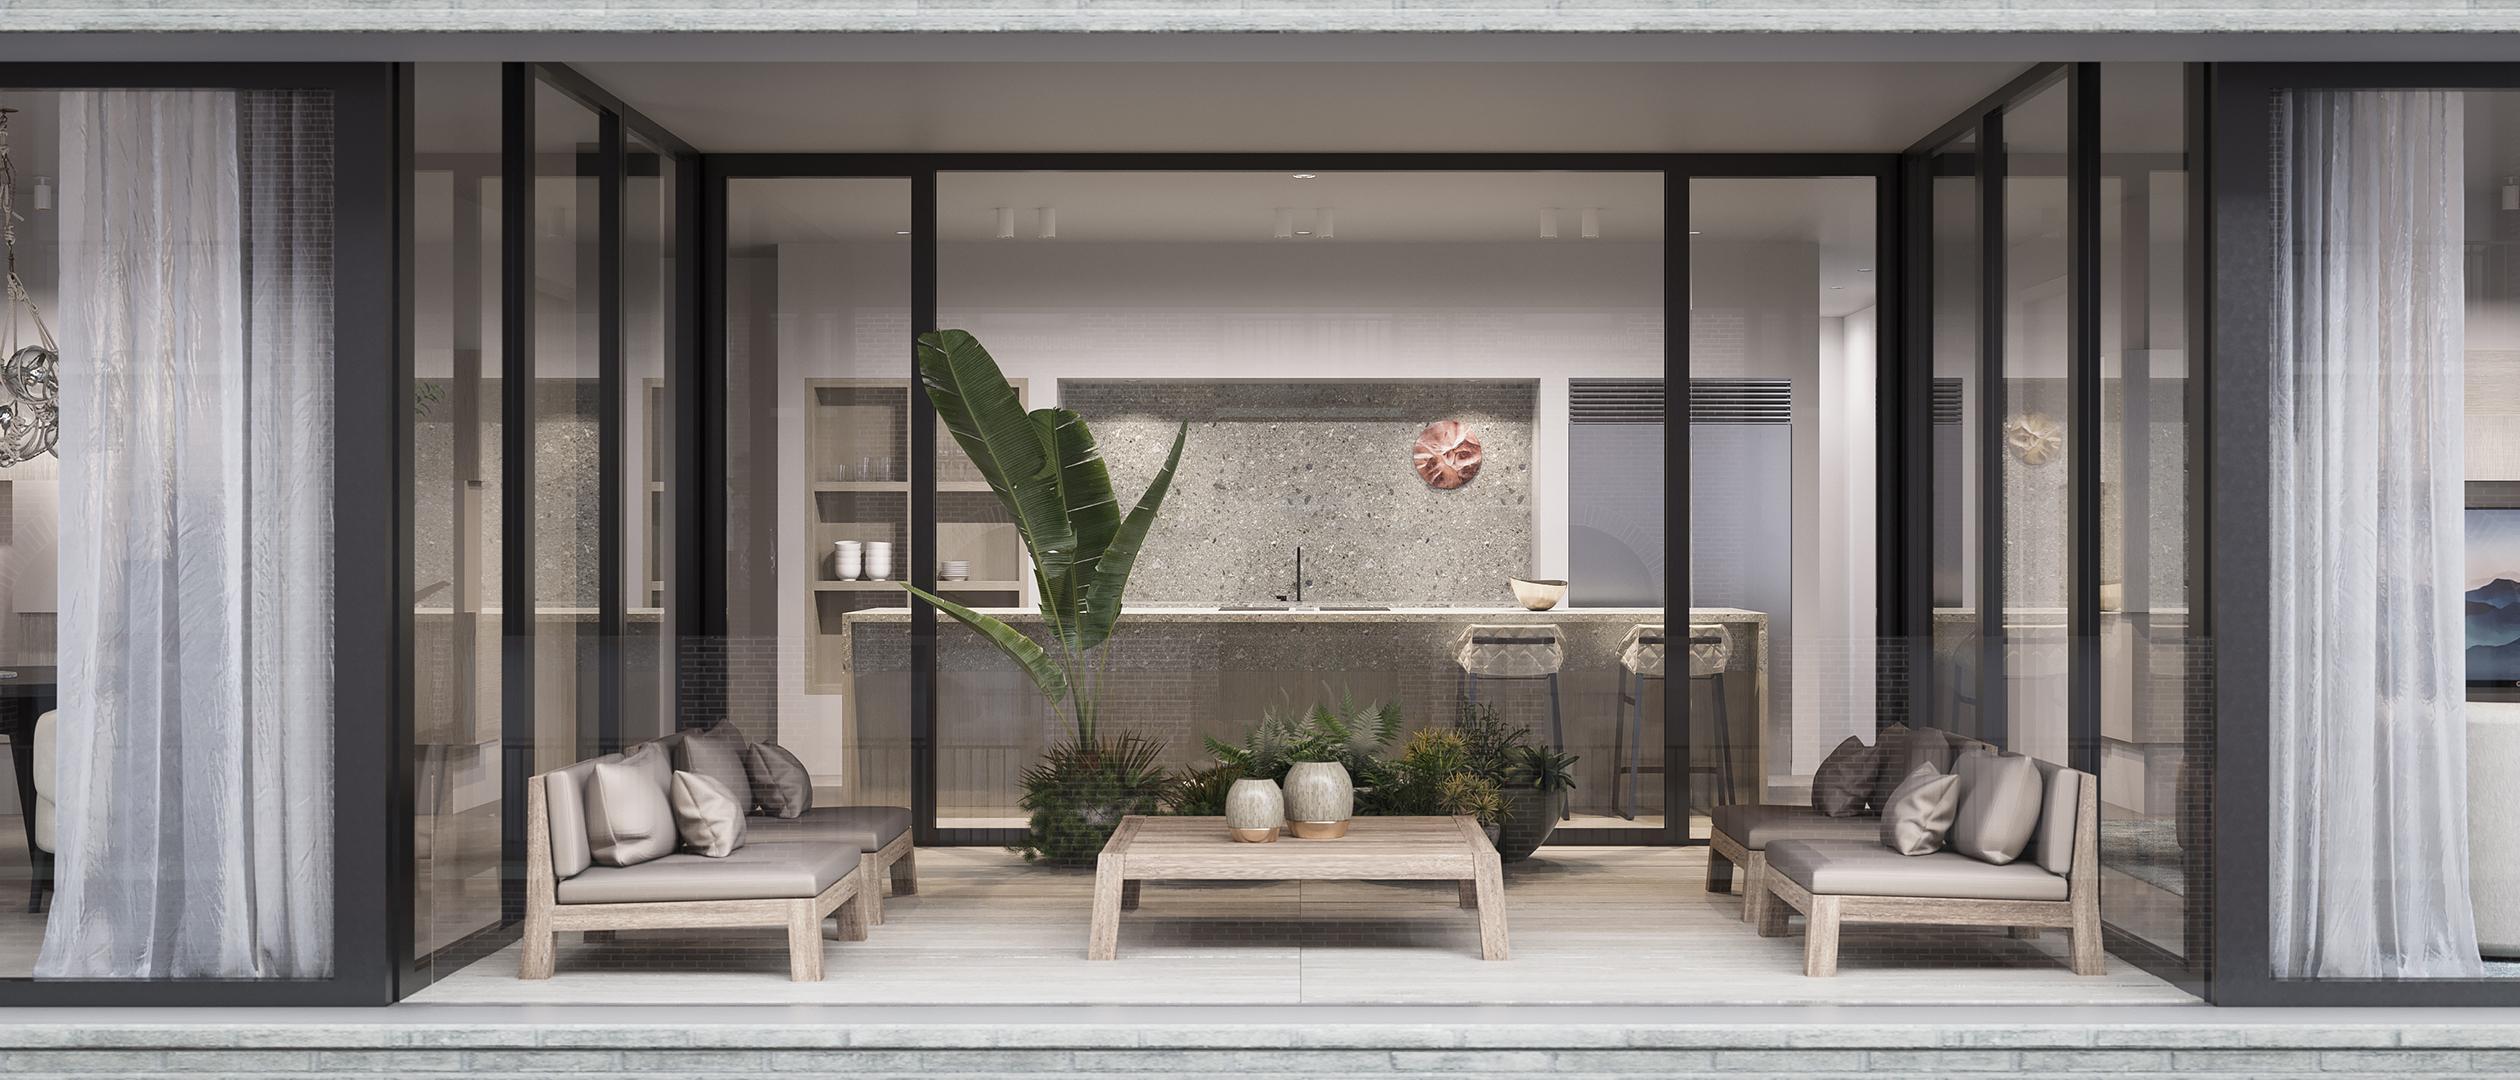 Eendraght Exclusive Apartments